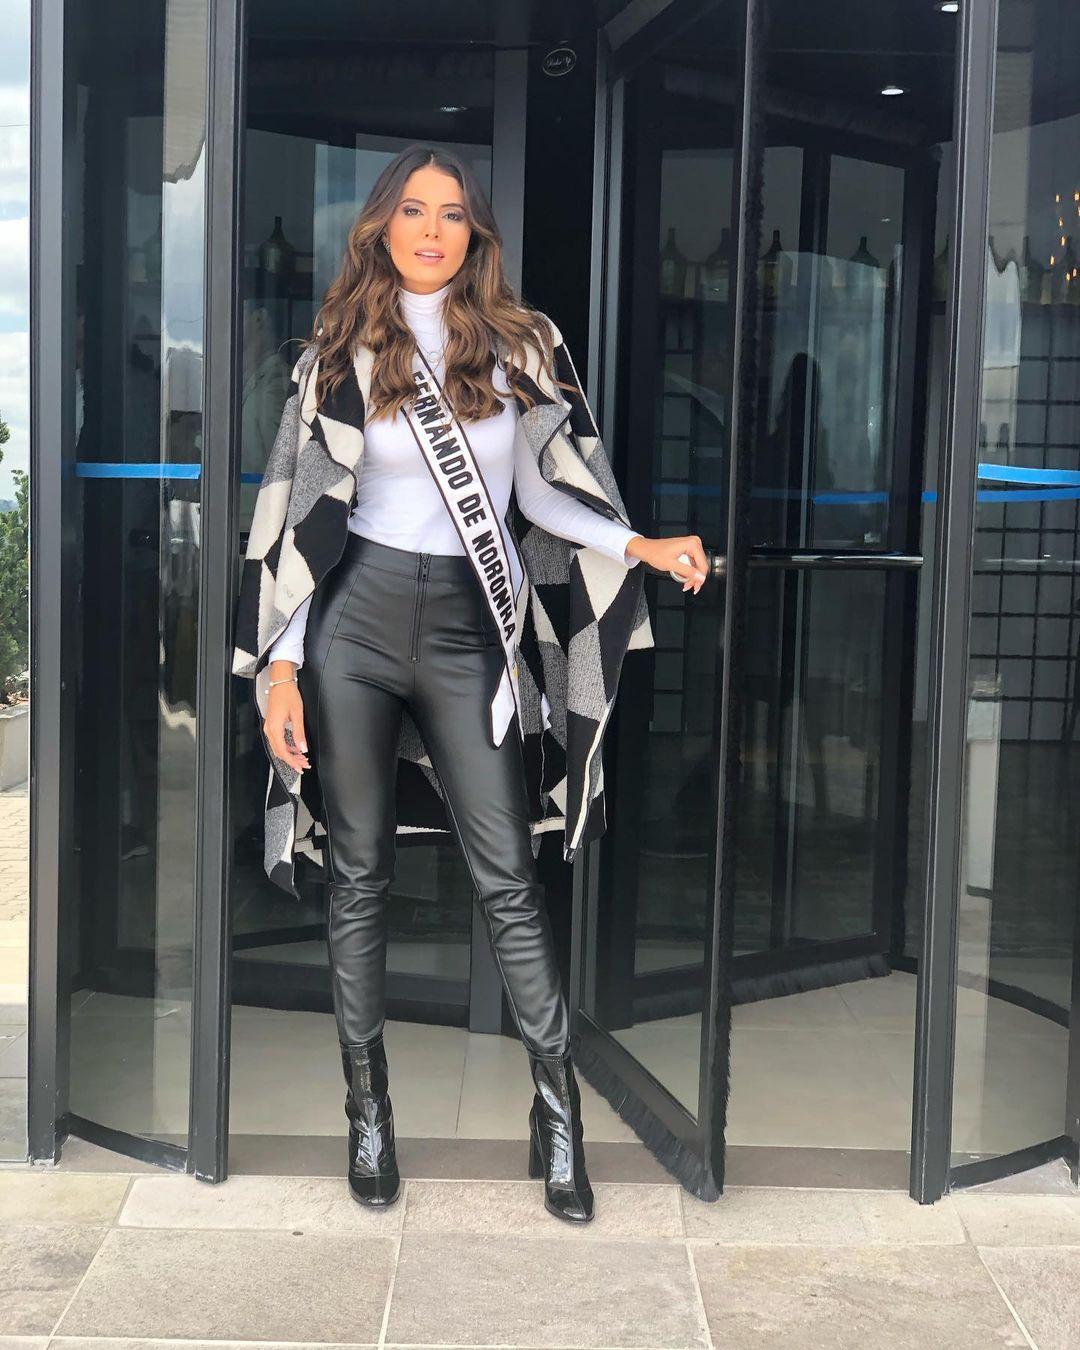 iully thaisa, top 5 de miss brasil mundo 2019. - Página 4 Fymipe10